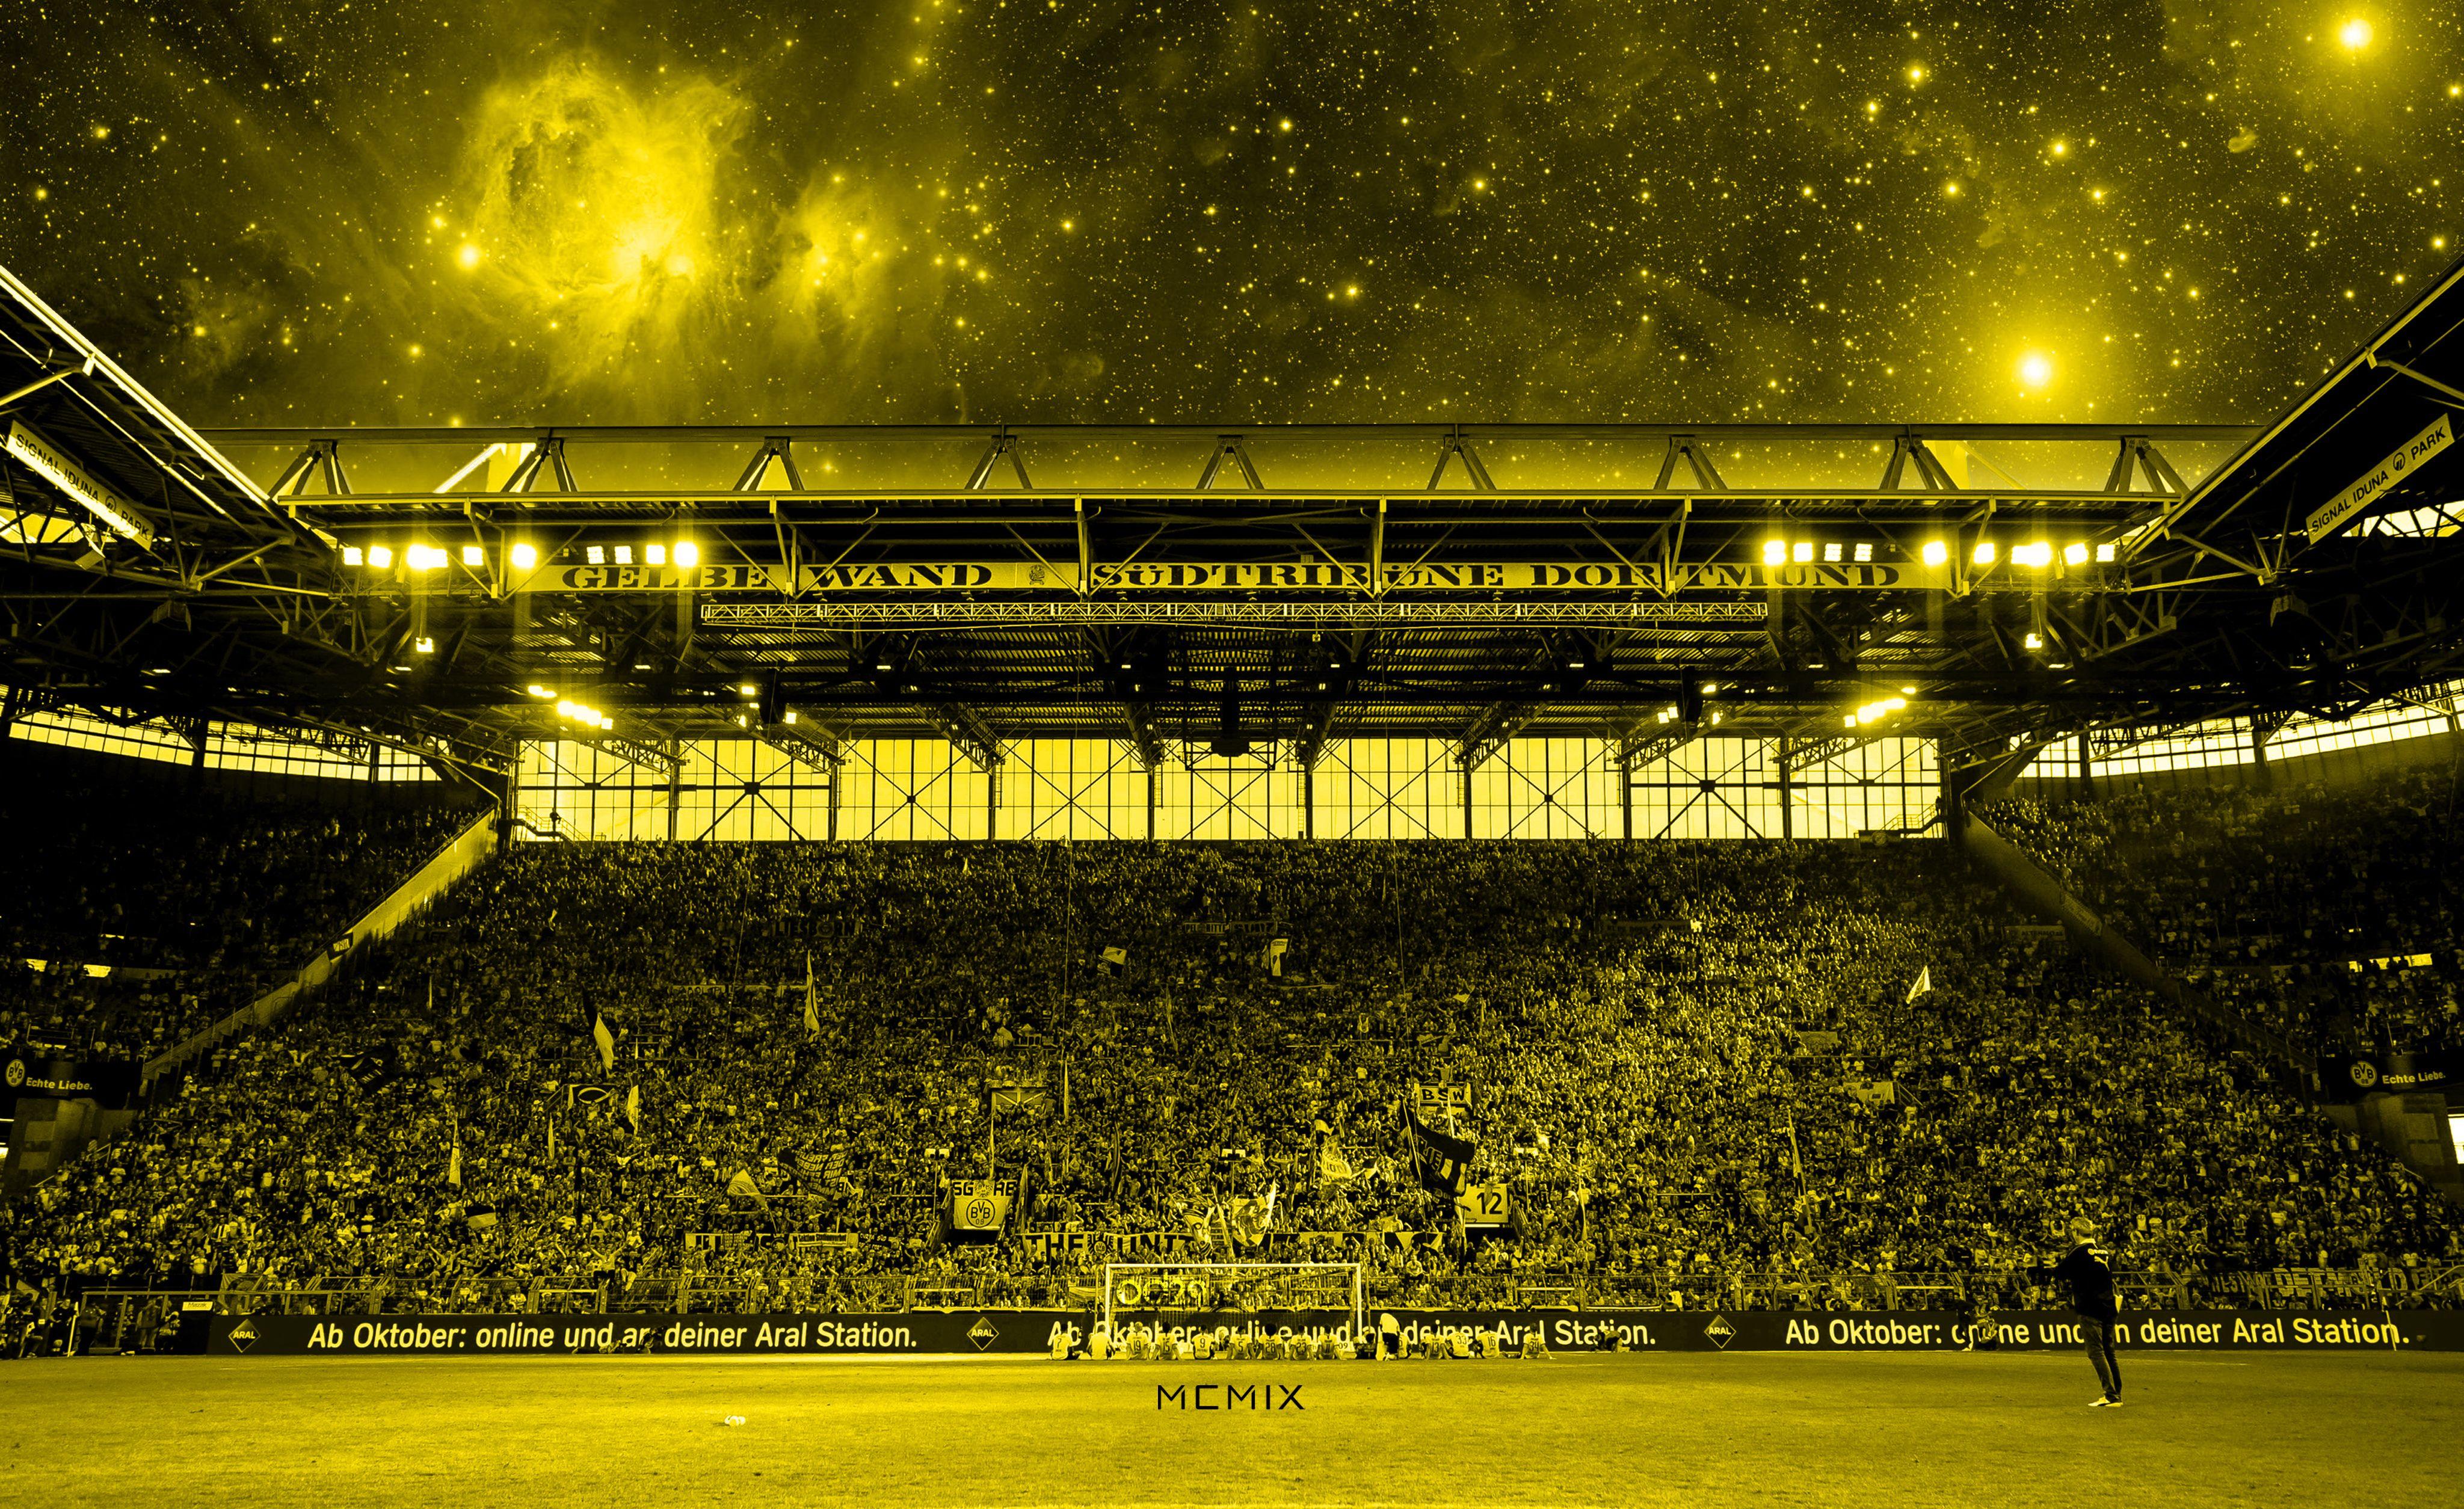 Bvb Dortmund Desktop Wallpaper In 2020 Borussia Dortmund Wallpaper Dortmund Borussia Dortmund